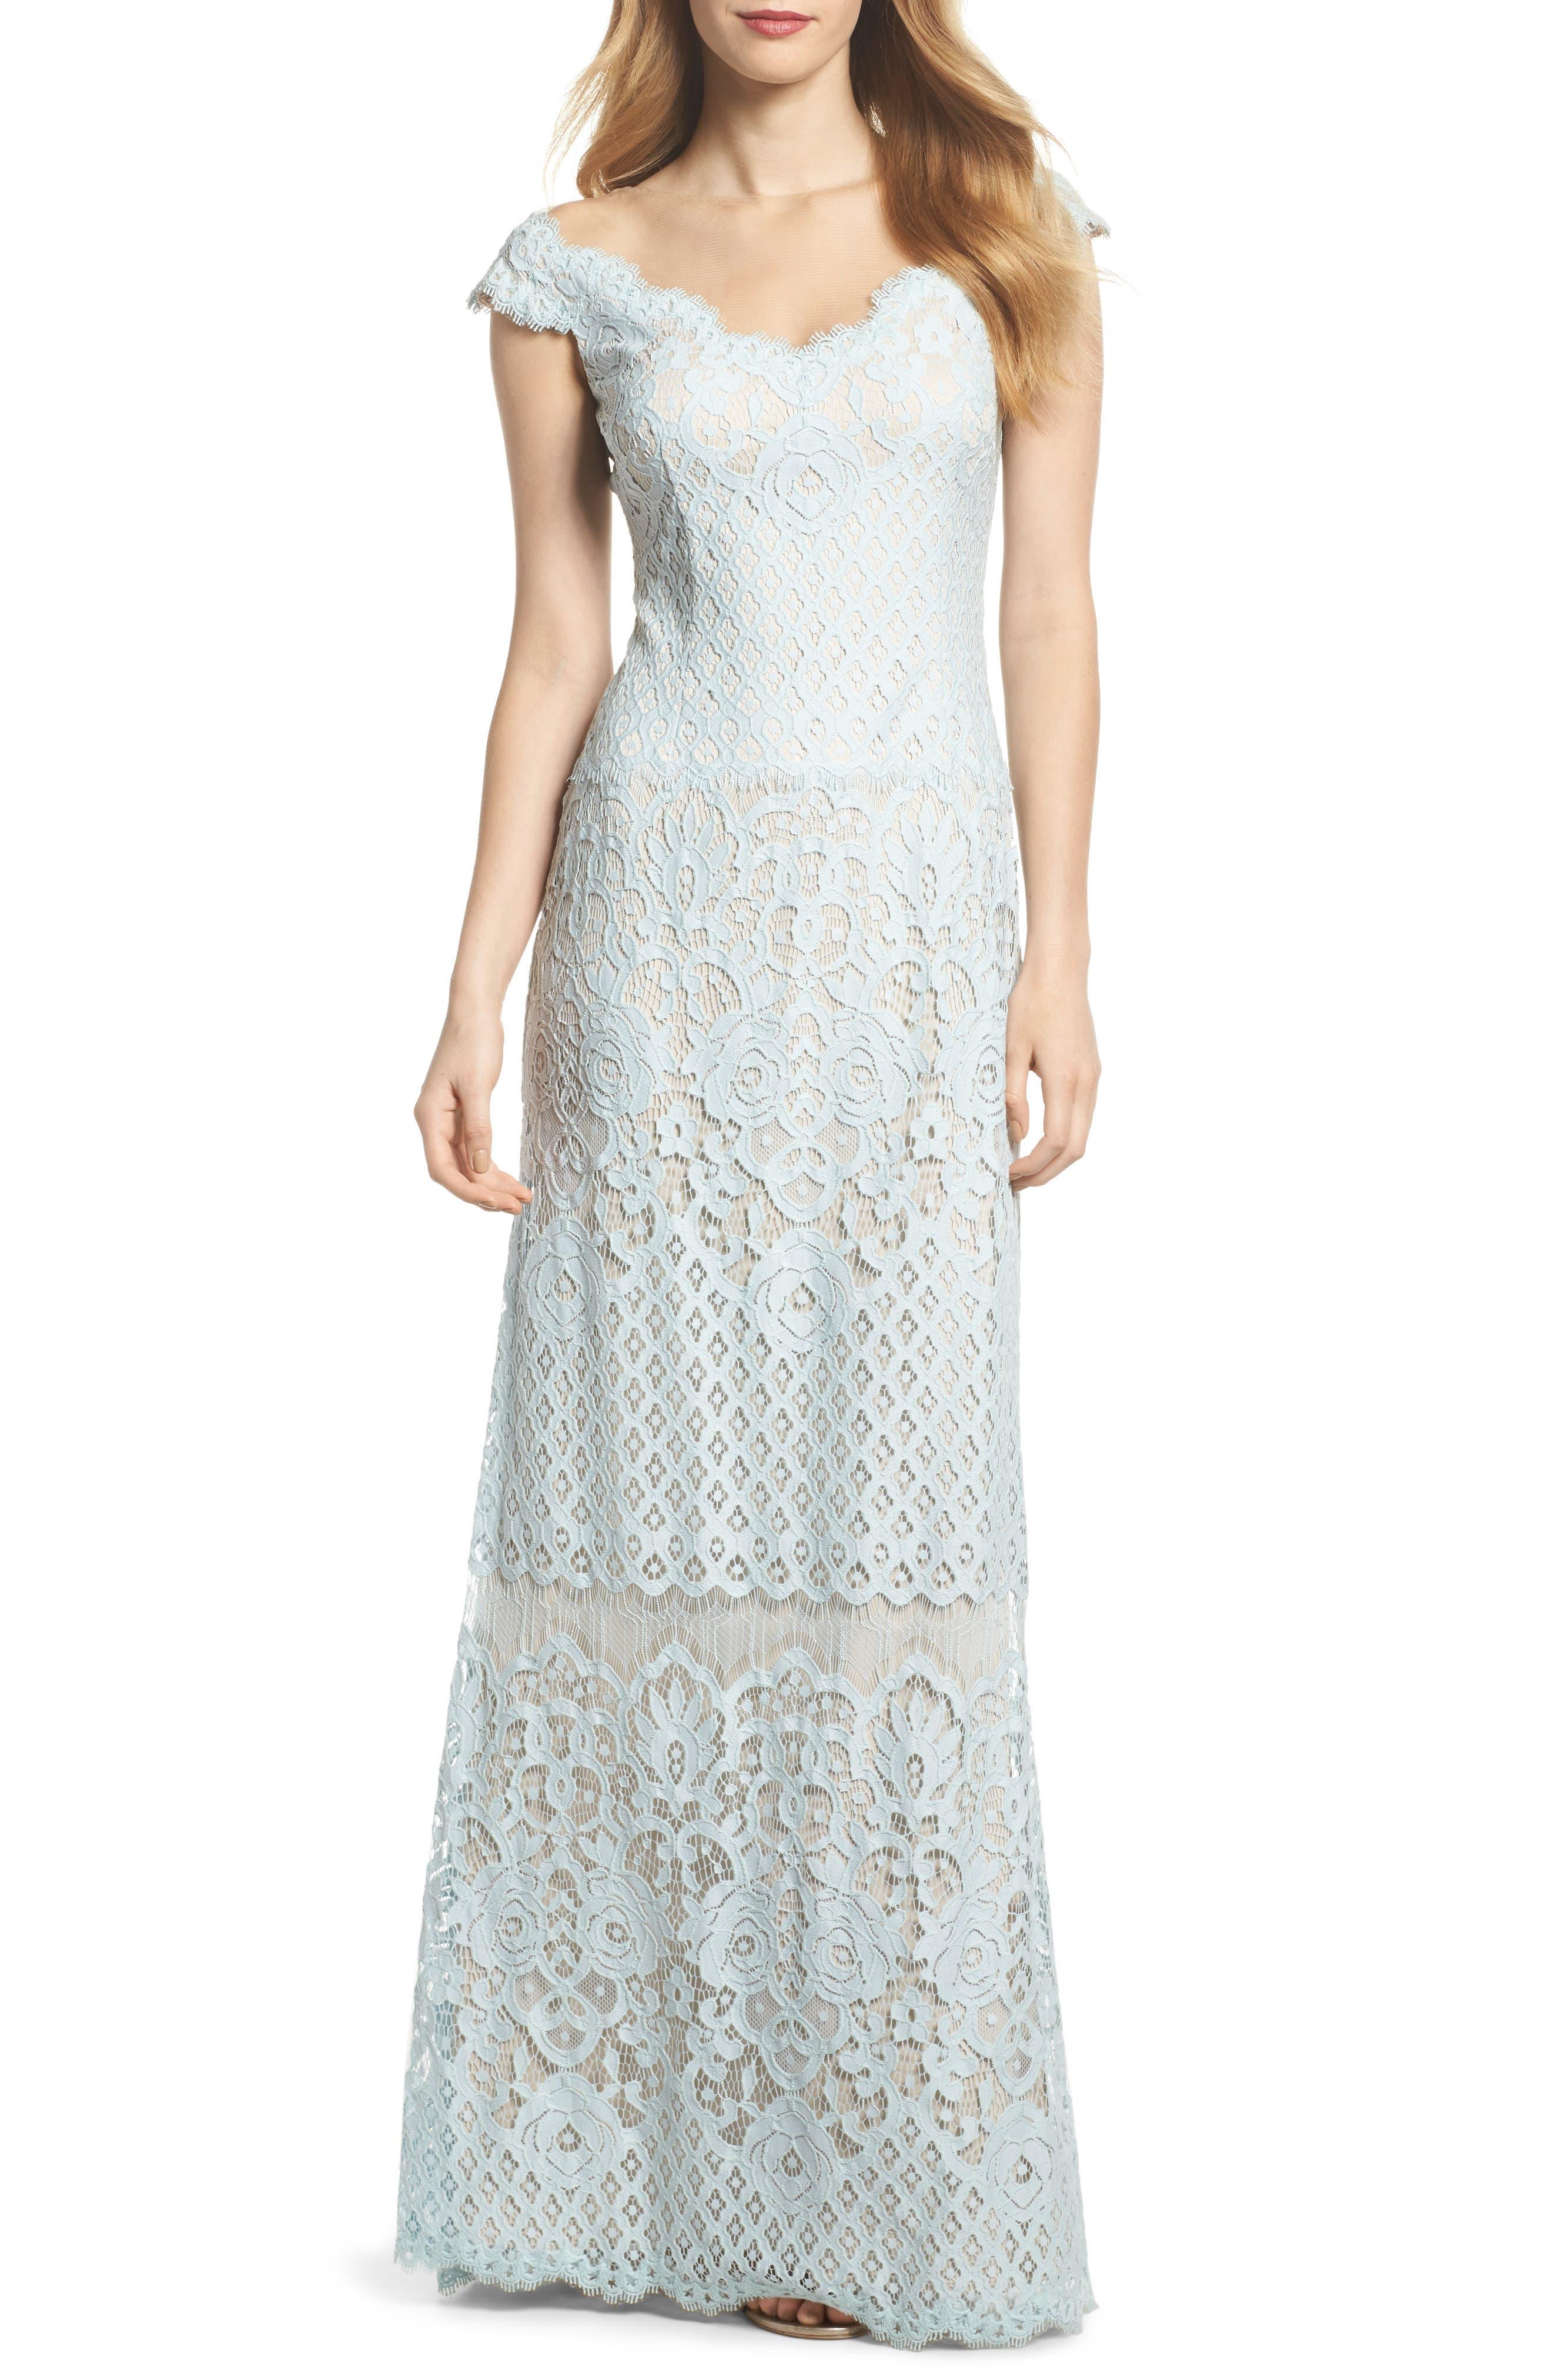 Alternate Image 1 Selected - Tadashi Shoji Illusion Neck Lace Column Gown